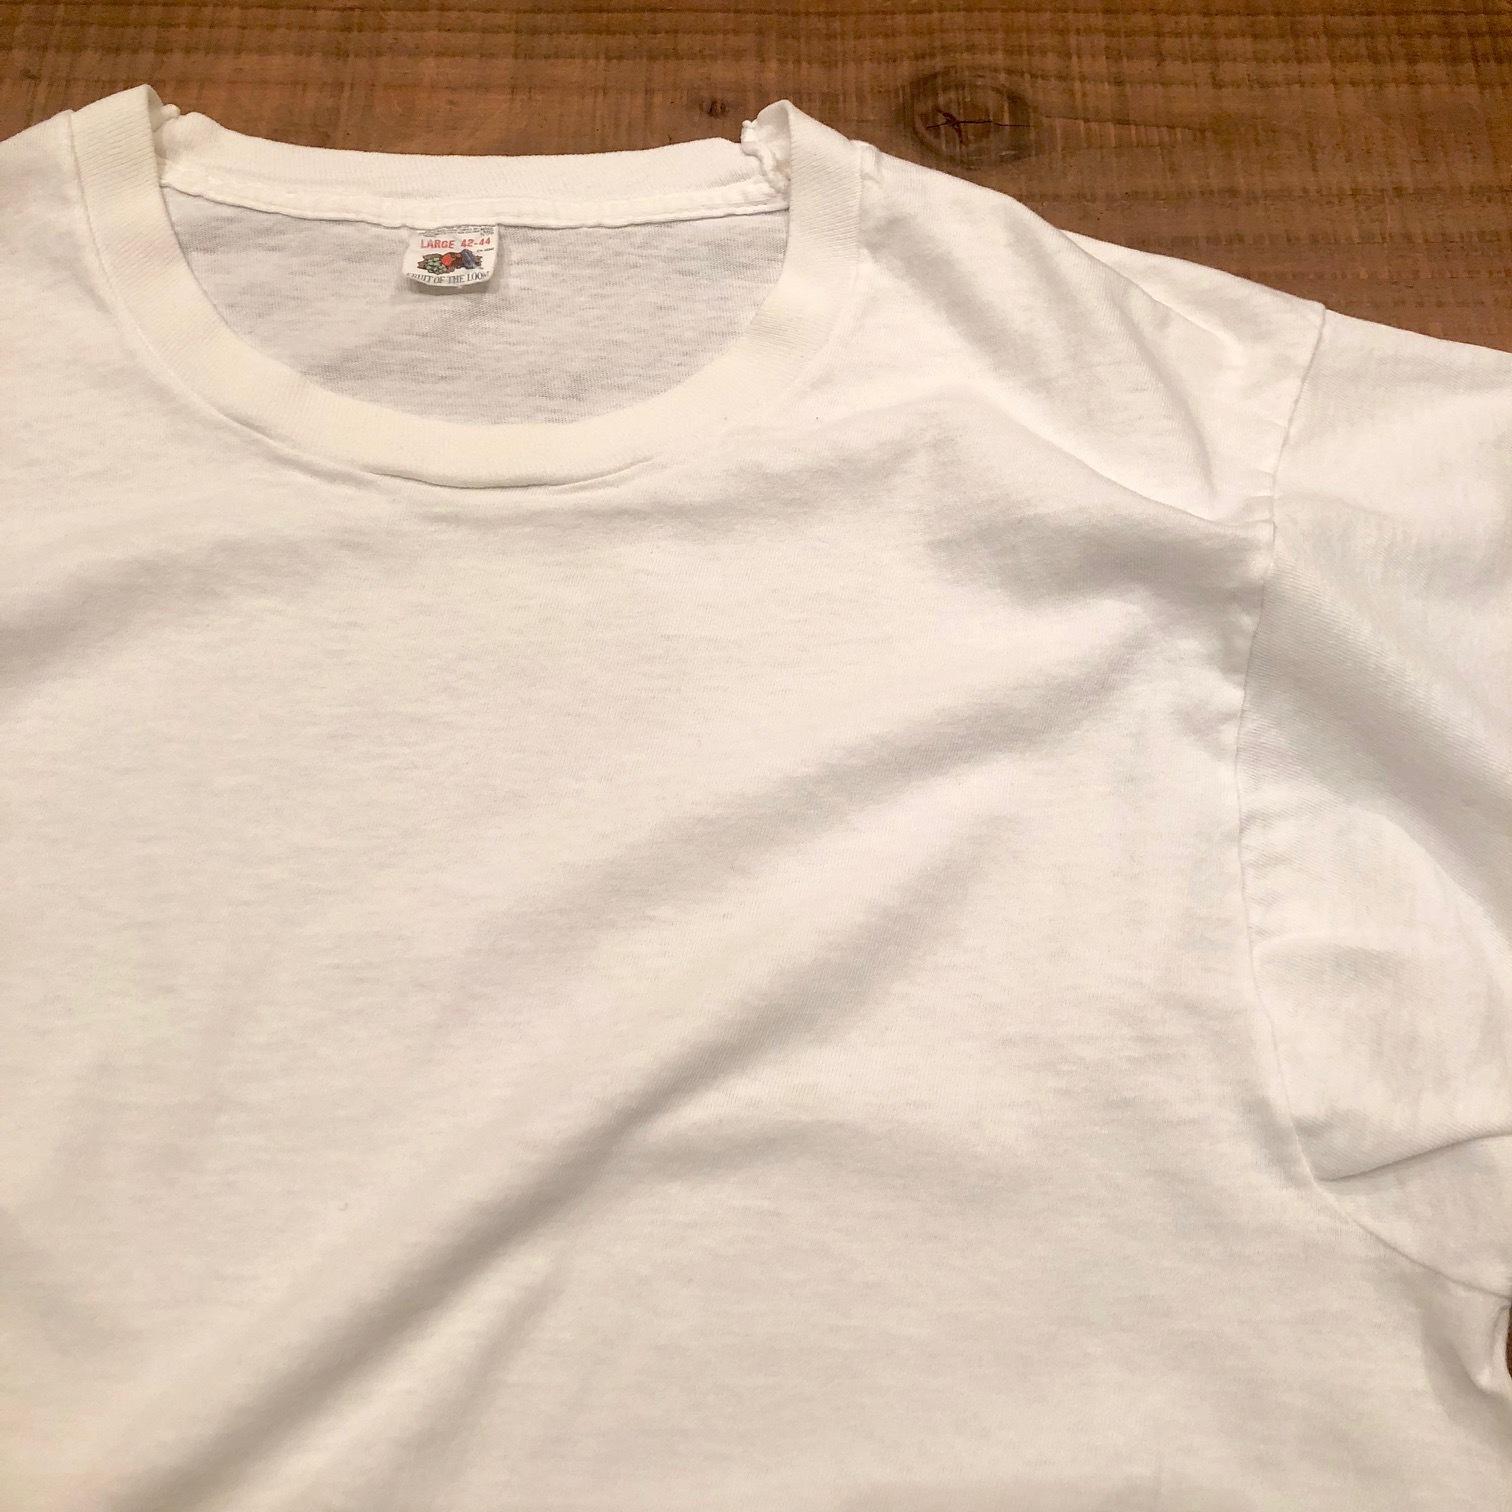 "1970s \"" O.P - OCEAN PACIFIC - \"" 60/40 - BACK CLOTH - vintage P/O SHIRTS ._d0172088_22053683.jpg"